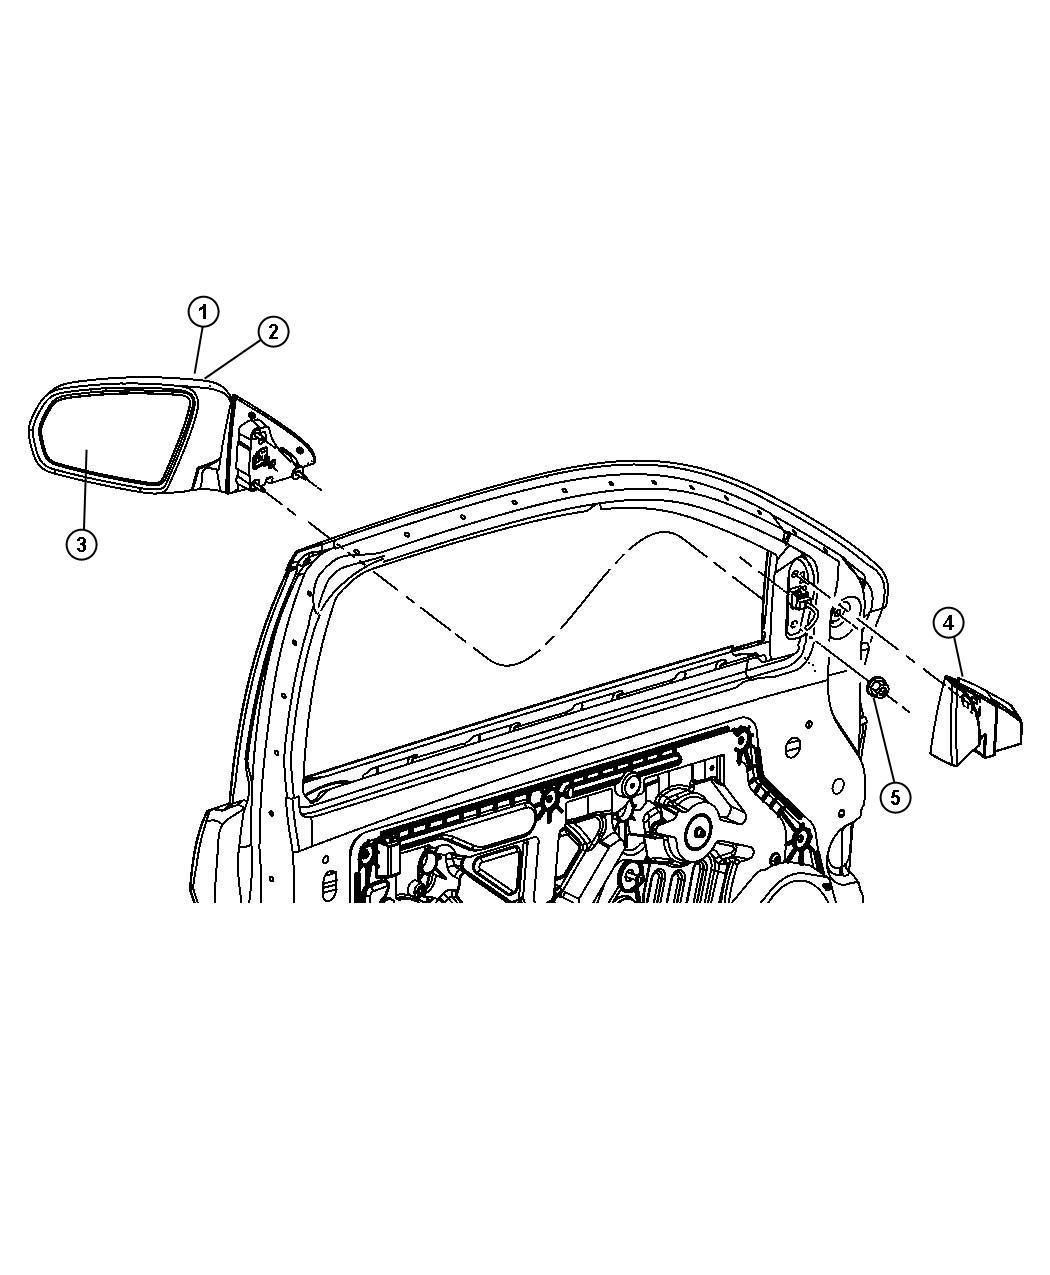 Chrysler Sebring Mirror Outside Rearview Right Color